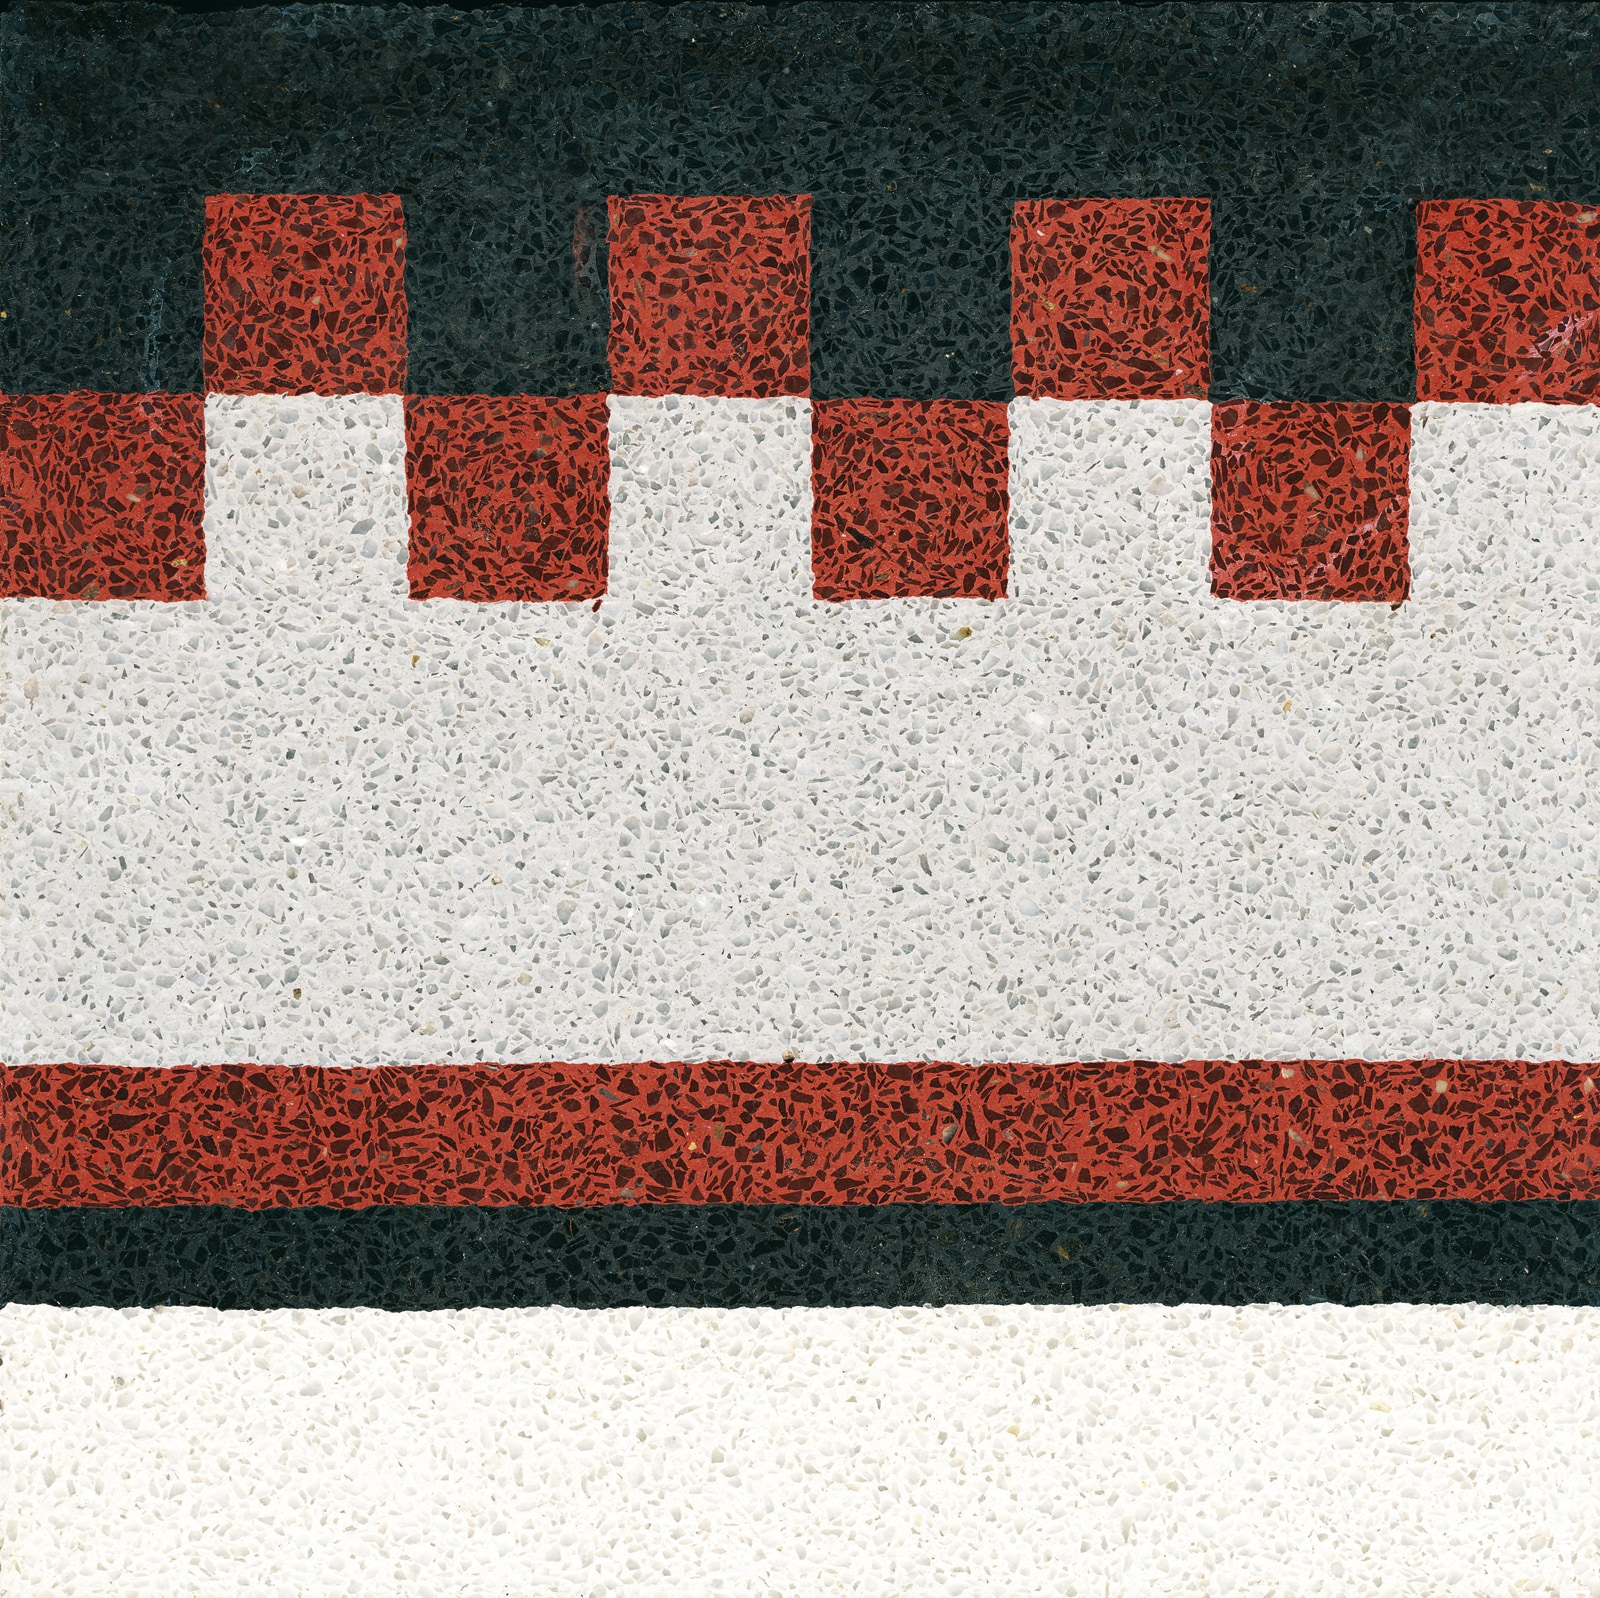 Terrazzoplatten-nummer-720452-via-gmbh | 730452